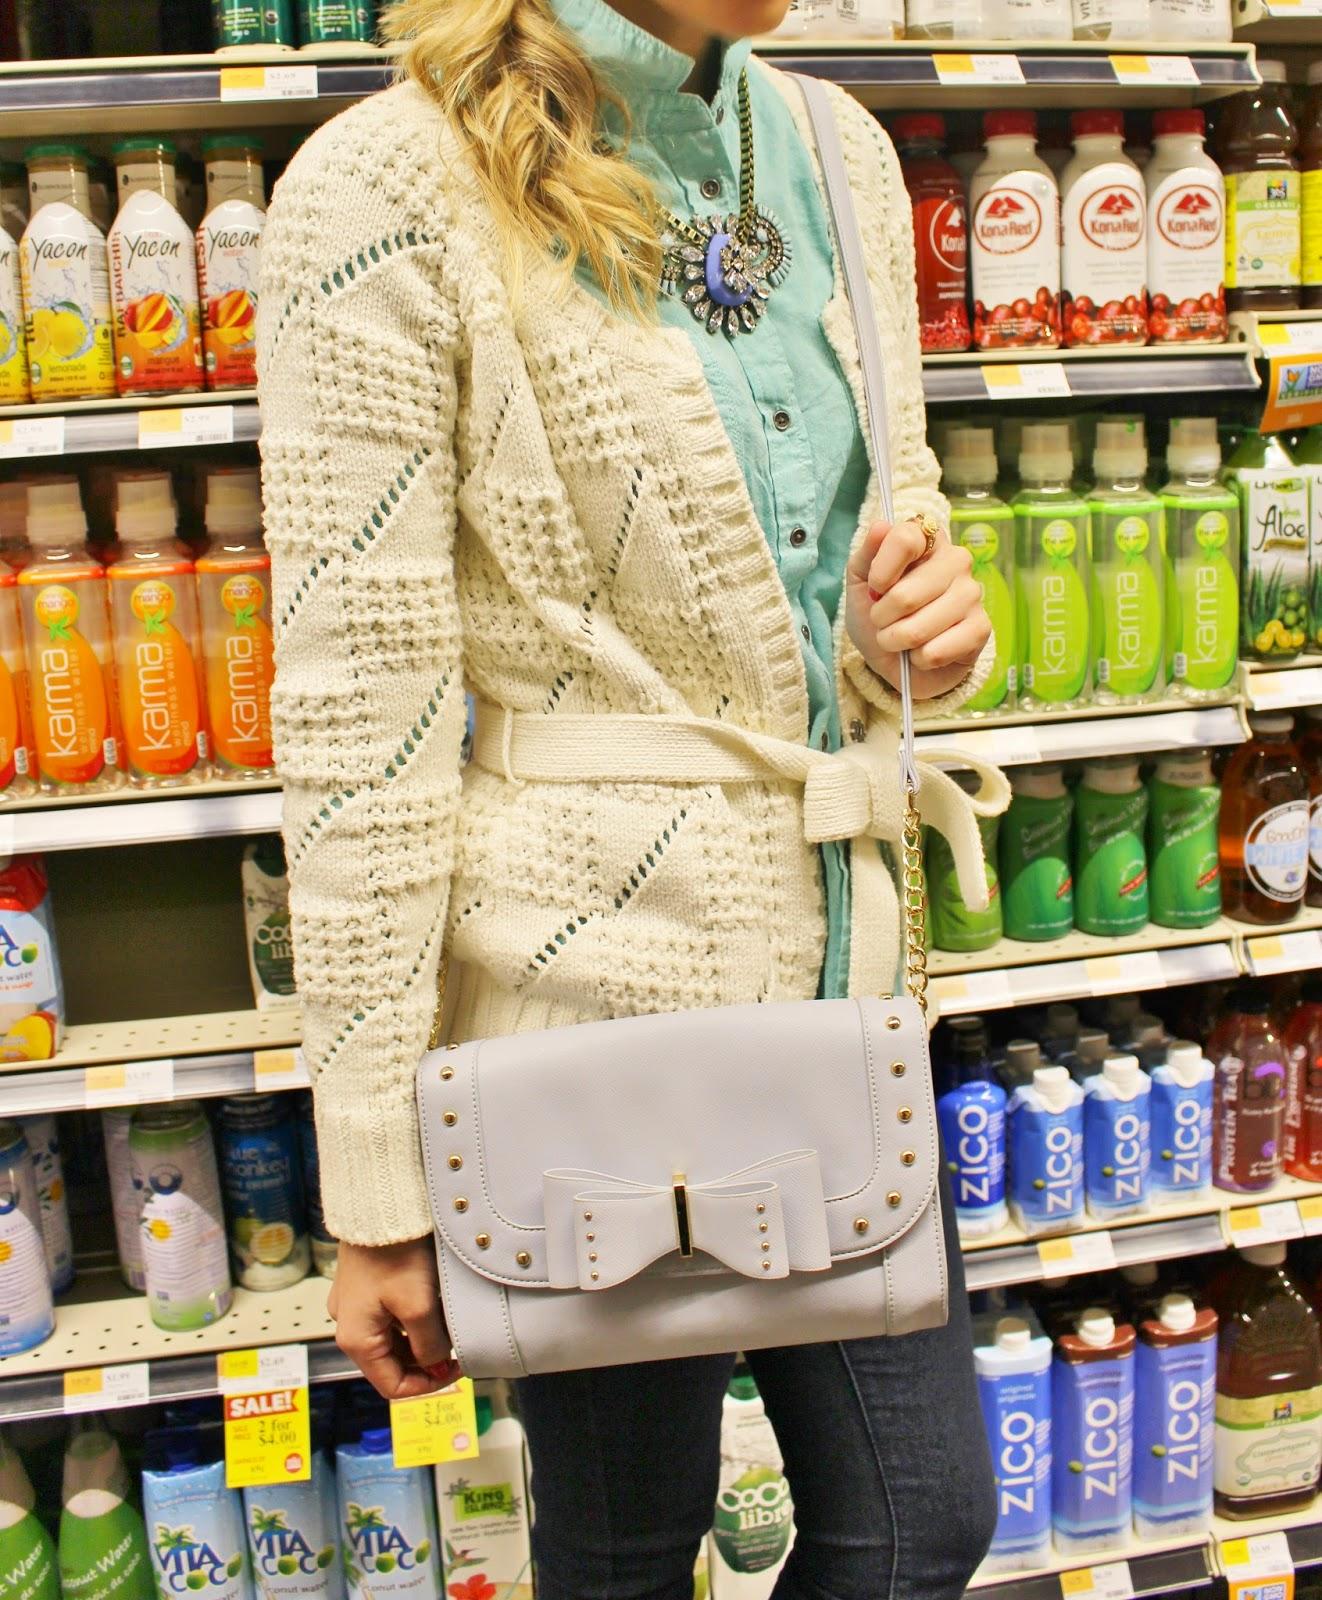 bijuleni, Whole Foods. Calvin Klein, T&J Designs, jewelry, Winners. winnerfabfind, Forever21, Zara,Zara Heels, turquoise blouse